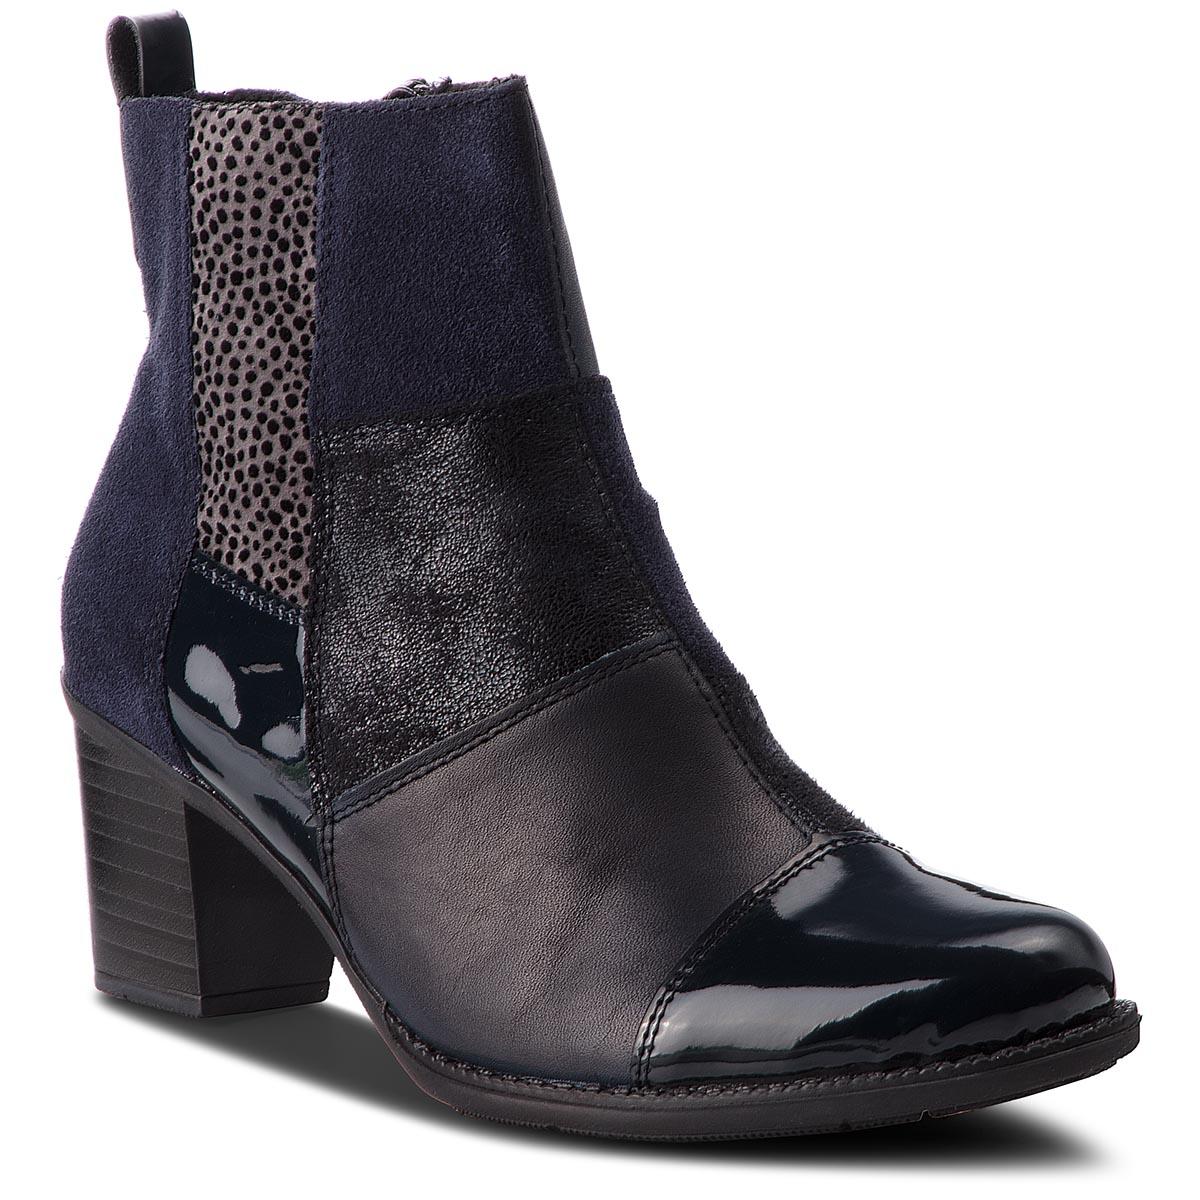 Magasított cipő RIEKER - Z7686-14 Blau - Glami.hu 40bf6119d3